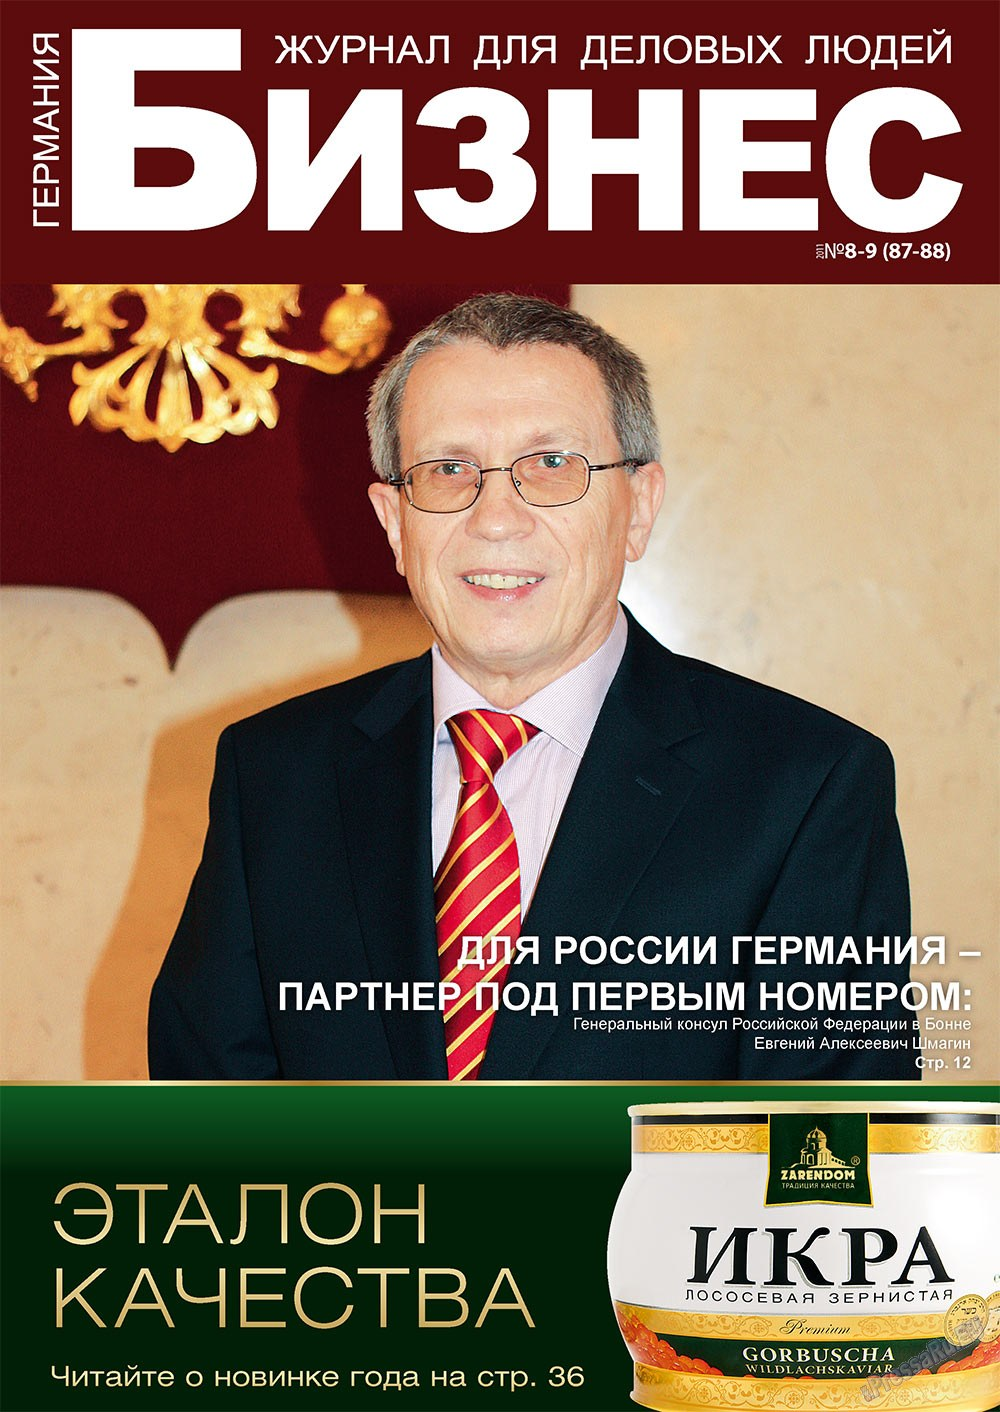 Бизнес (журнал). 2011 год, номер 8, стр. 1